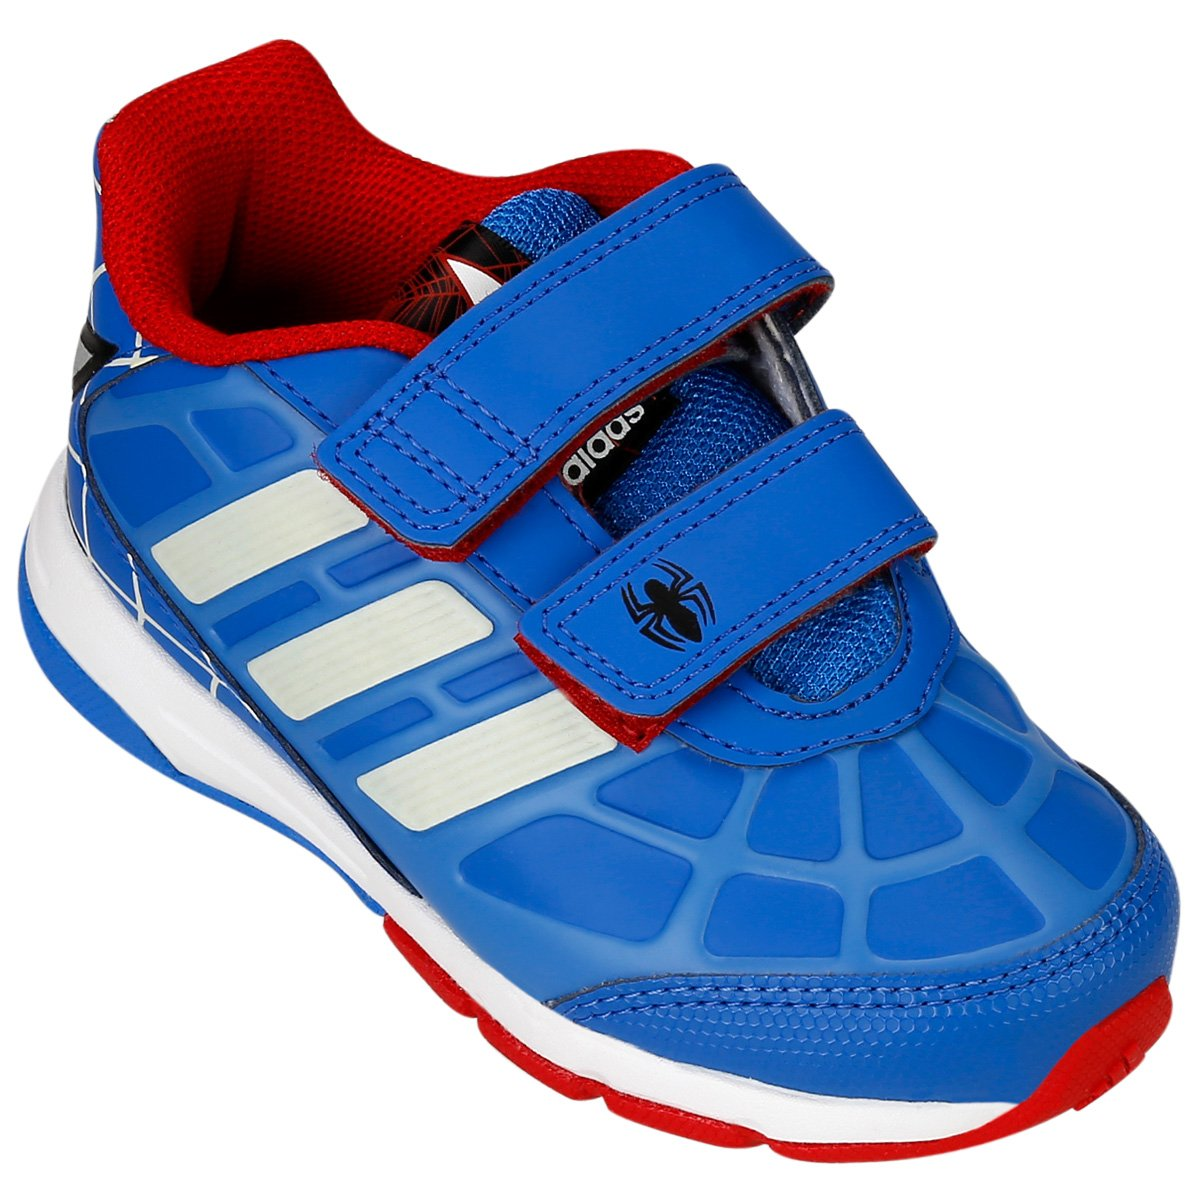 41f0a10c11d Tênis Adidas Disney Spiderman CF Infantil - Compre Agora